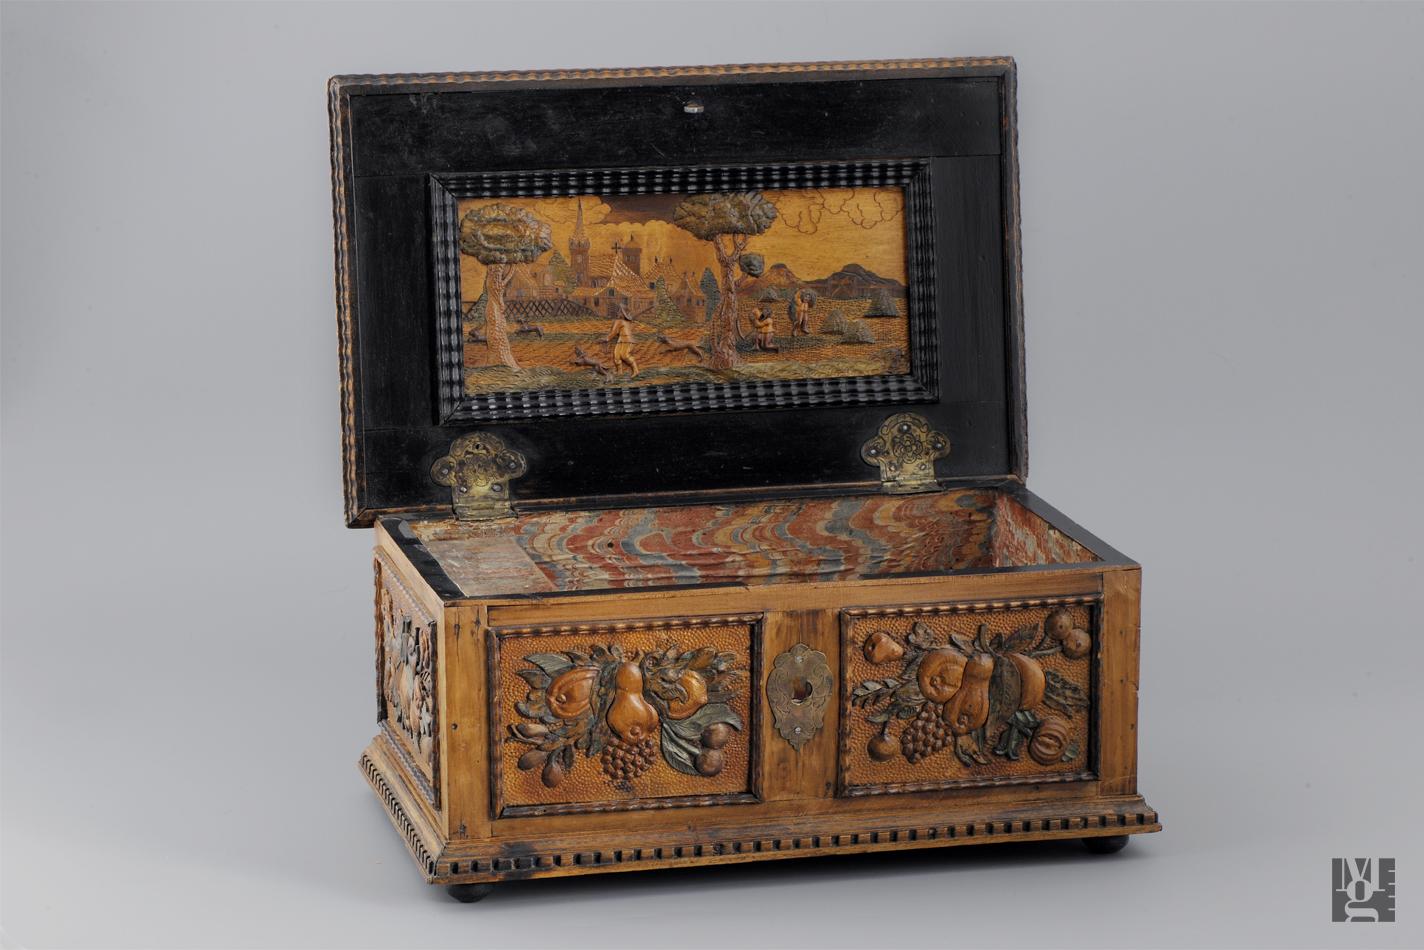 FileJewelry Box in Moravian Gallery (07).jpg & File:Jewelry Box in Moravian Gallery (07).jpg - Wikimedia Commons Aboutintivar.Com